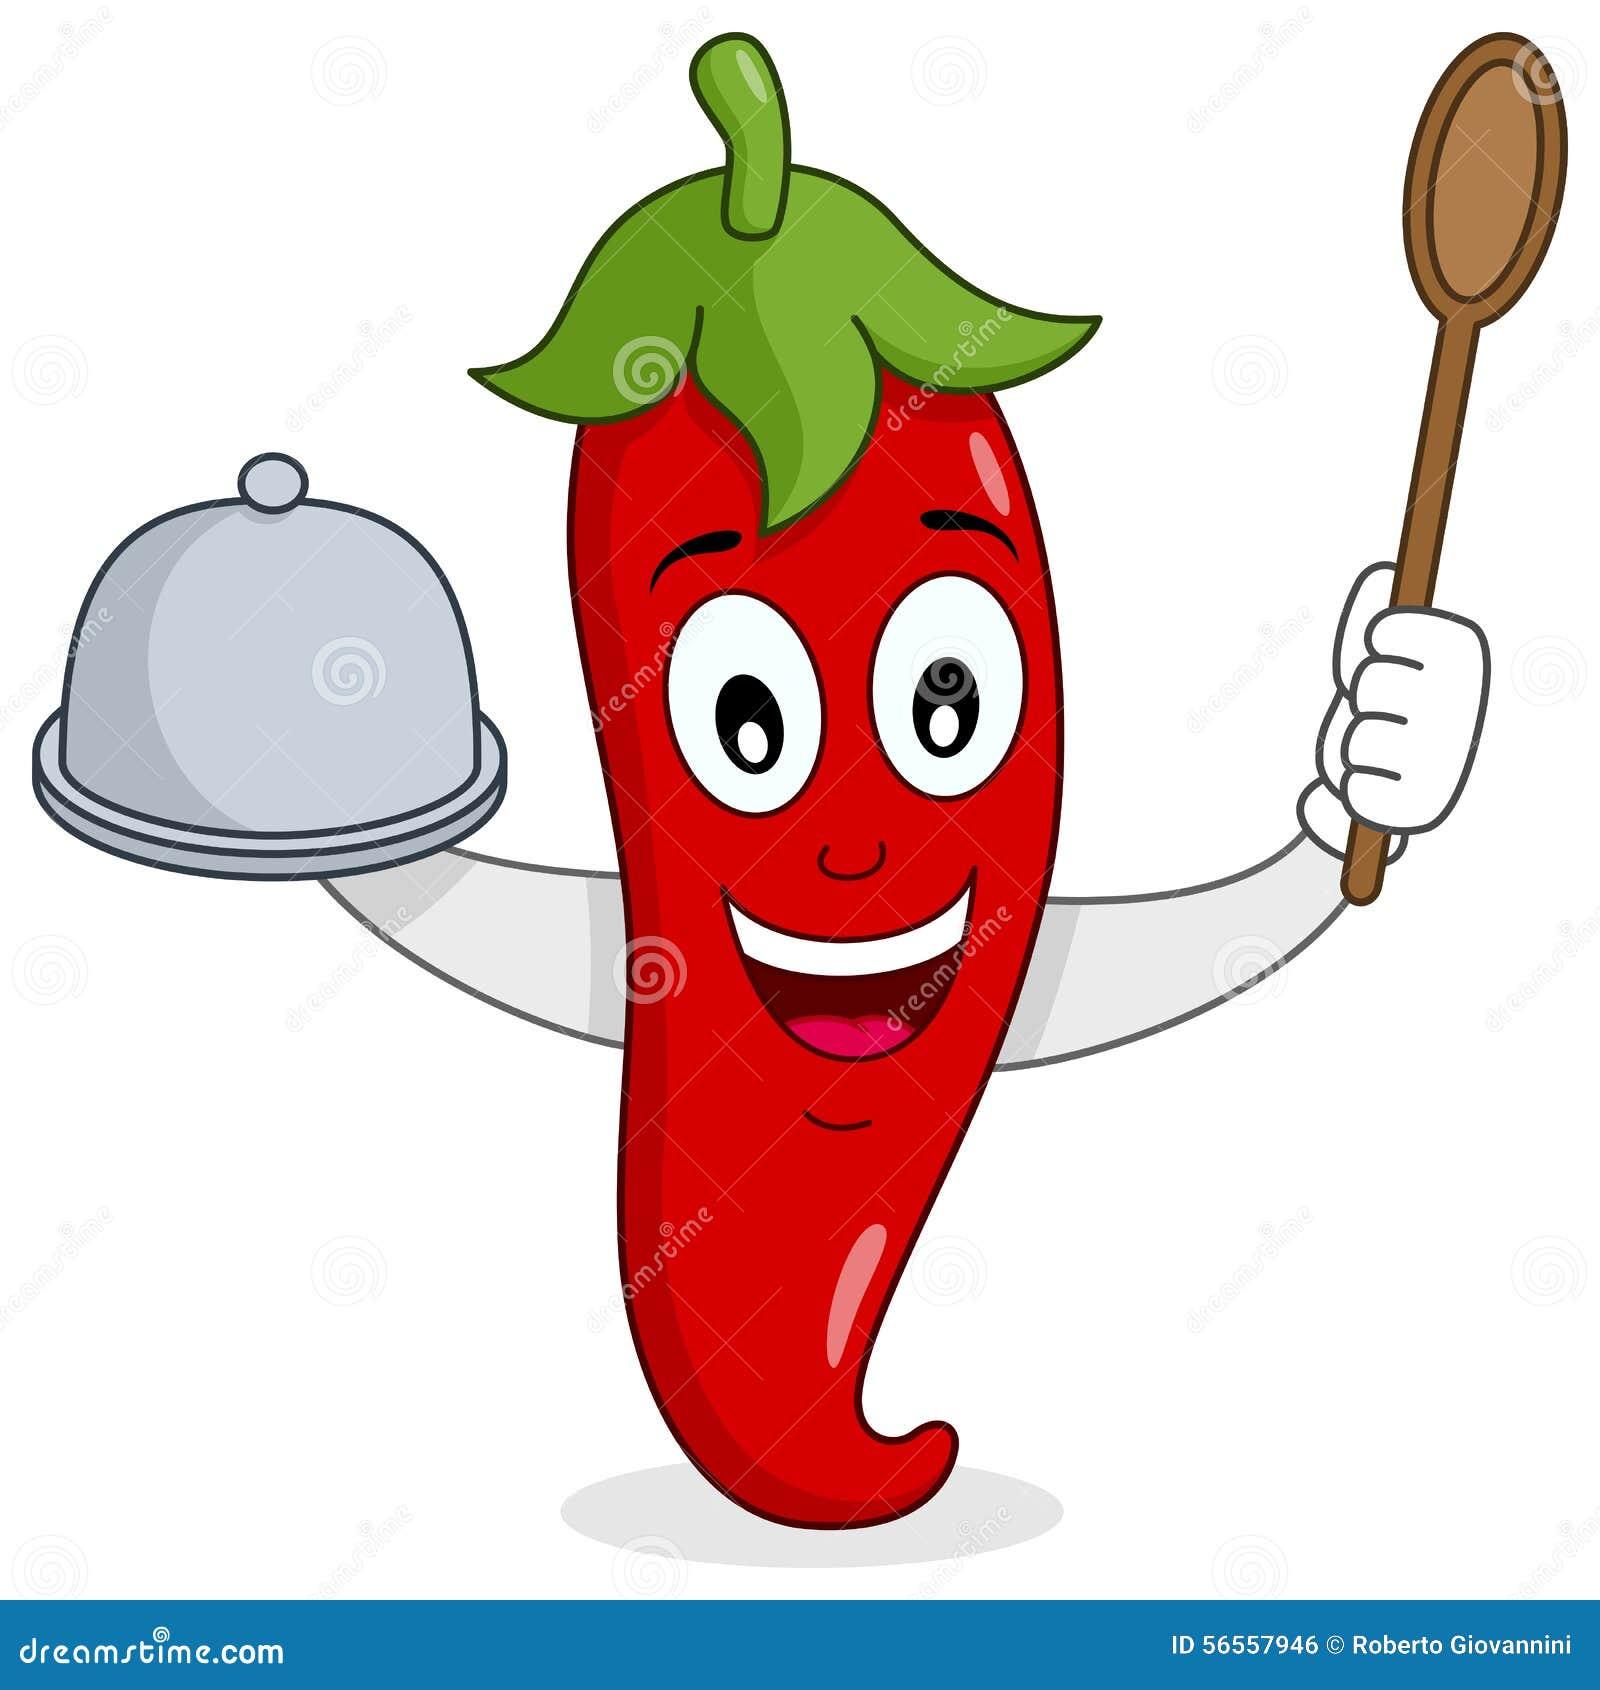 Chili Pepper candente con la bandeja y la cuchara